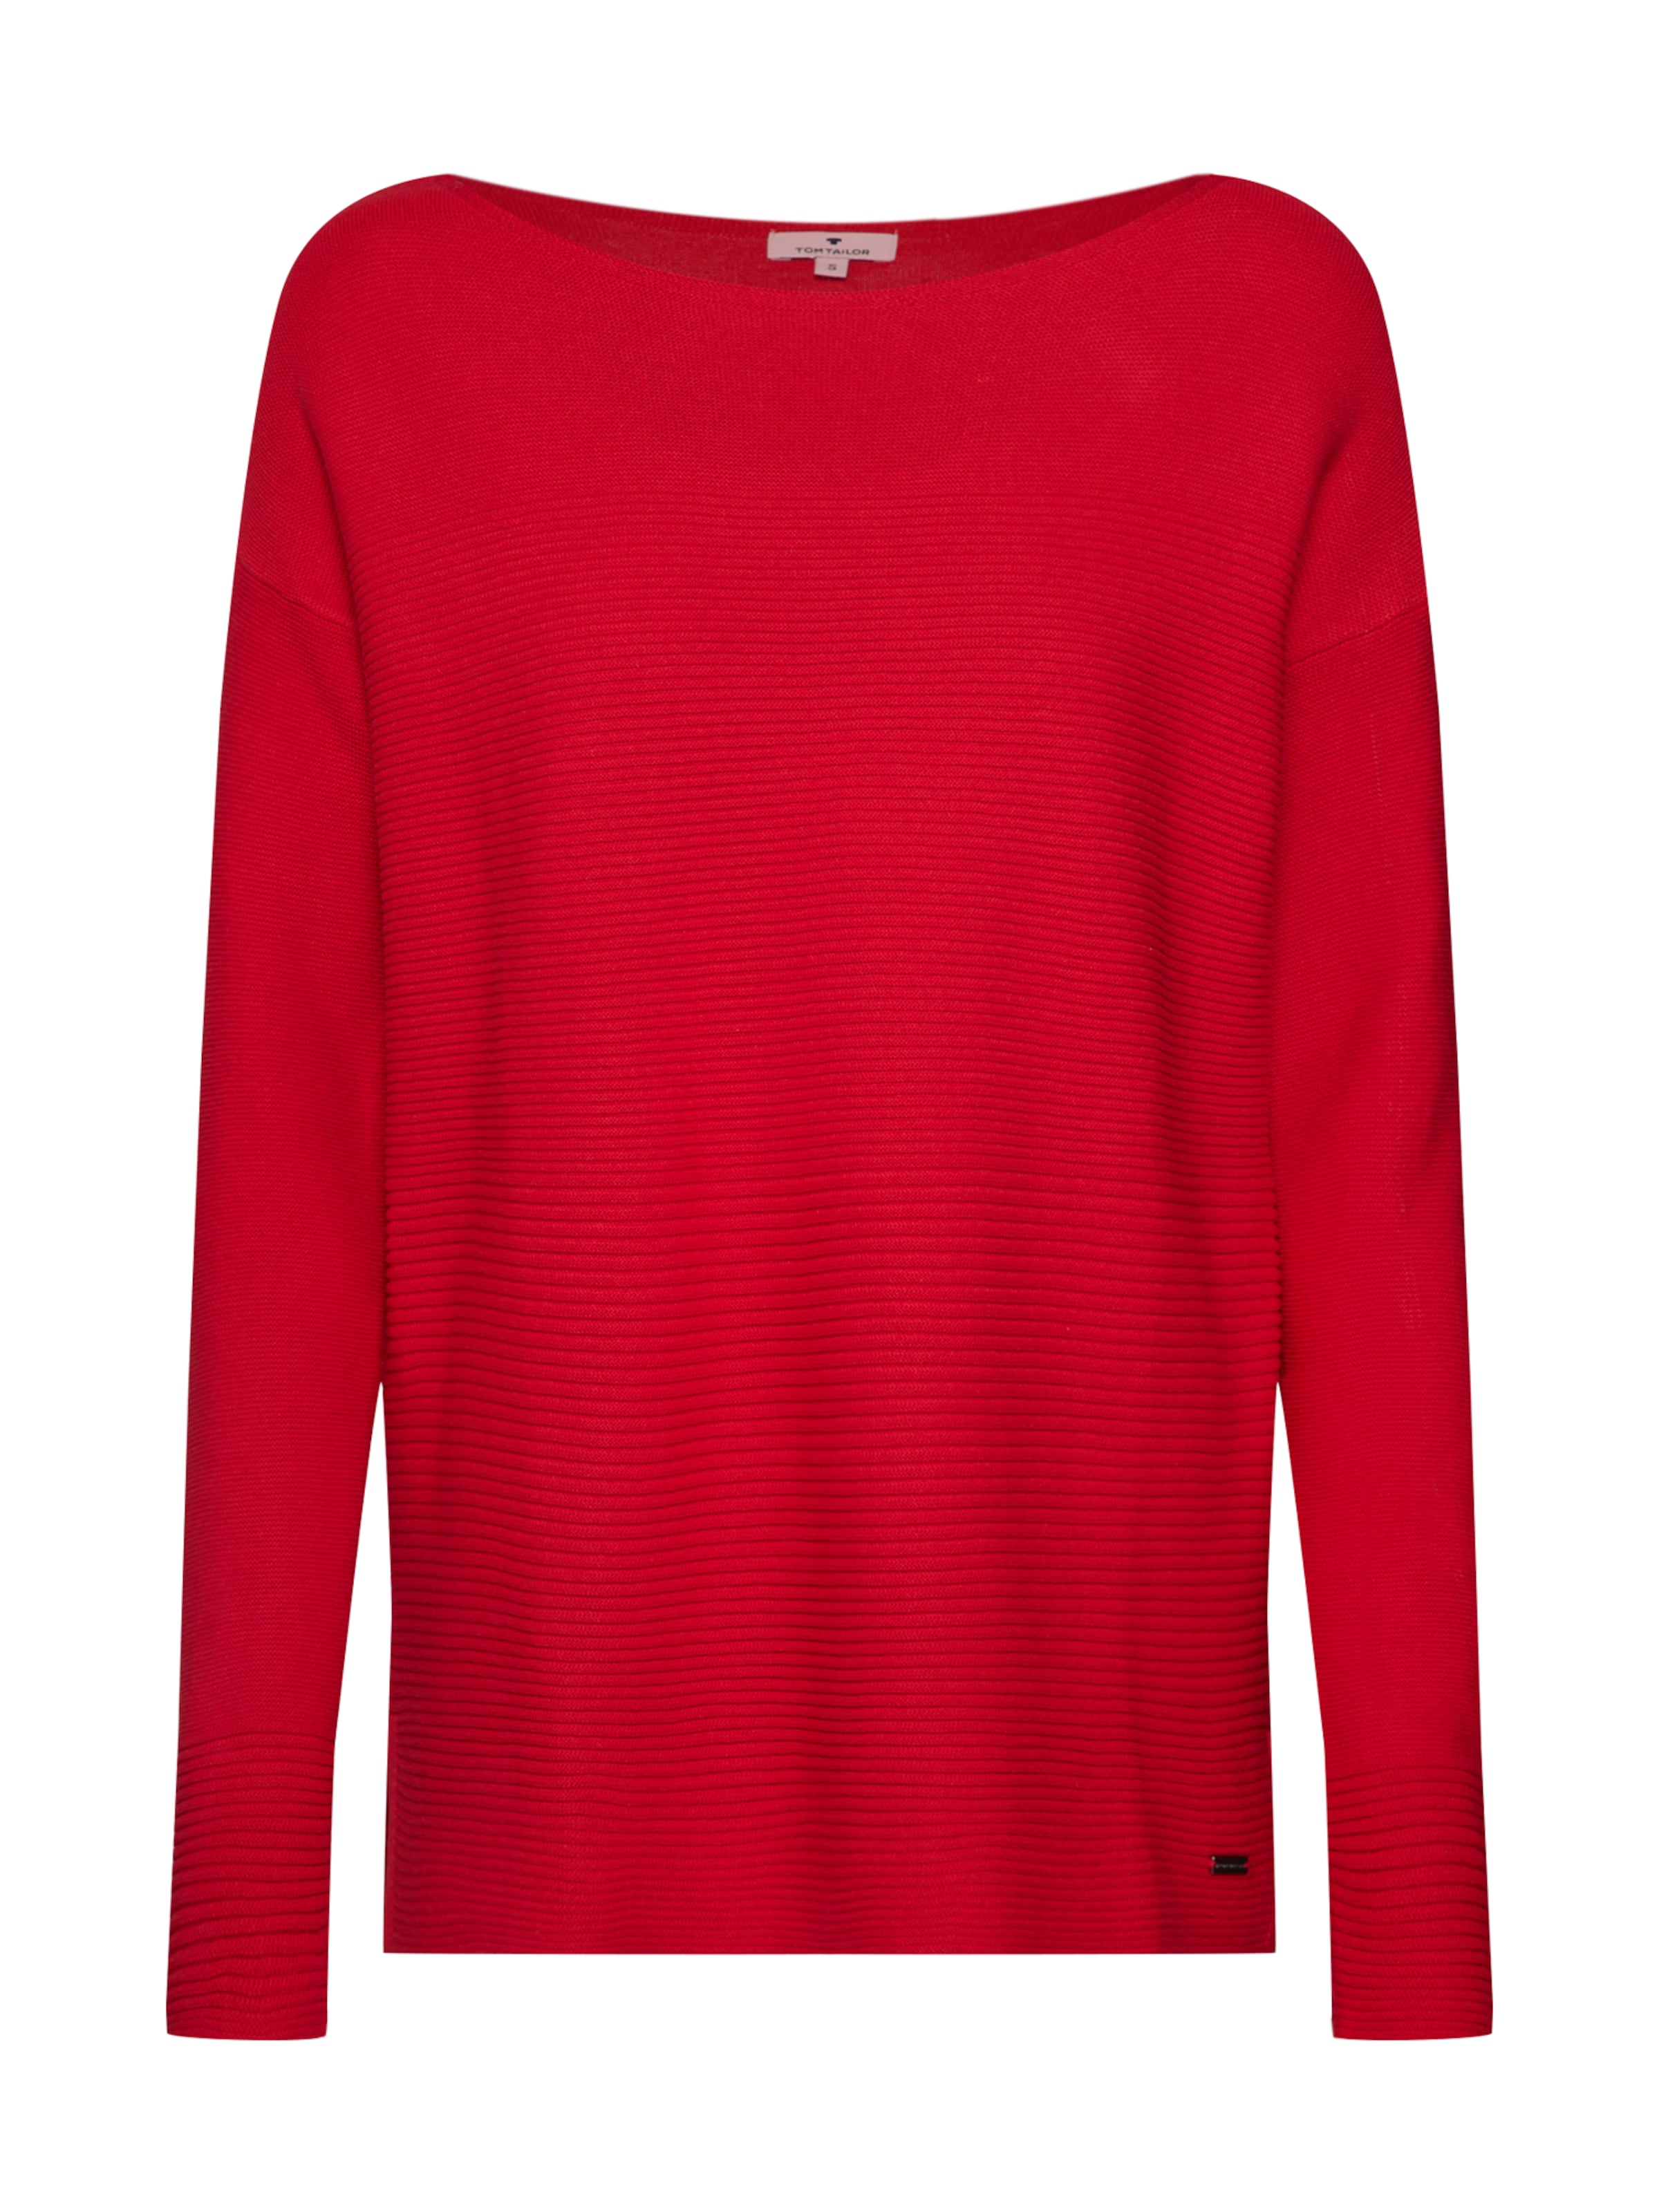 Rouge Tom En Sweat Tailor shirt B7qIx0r7